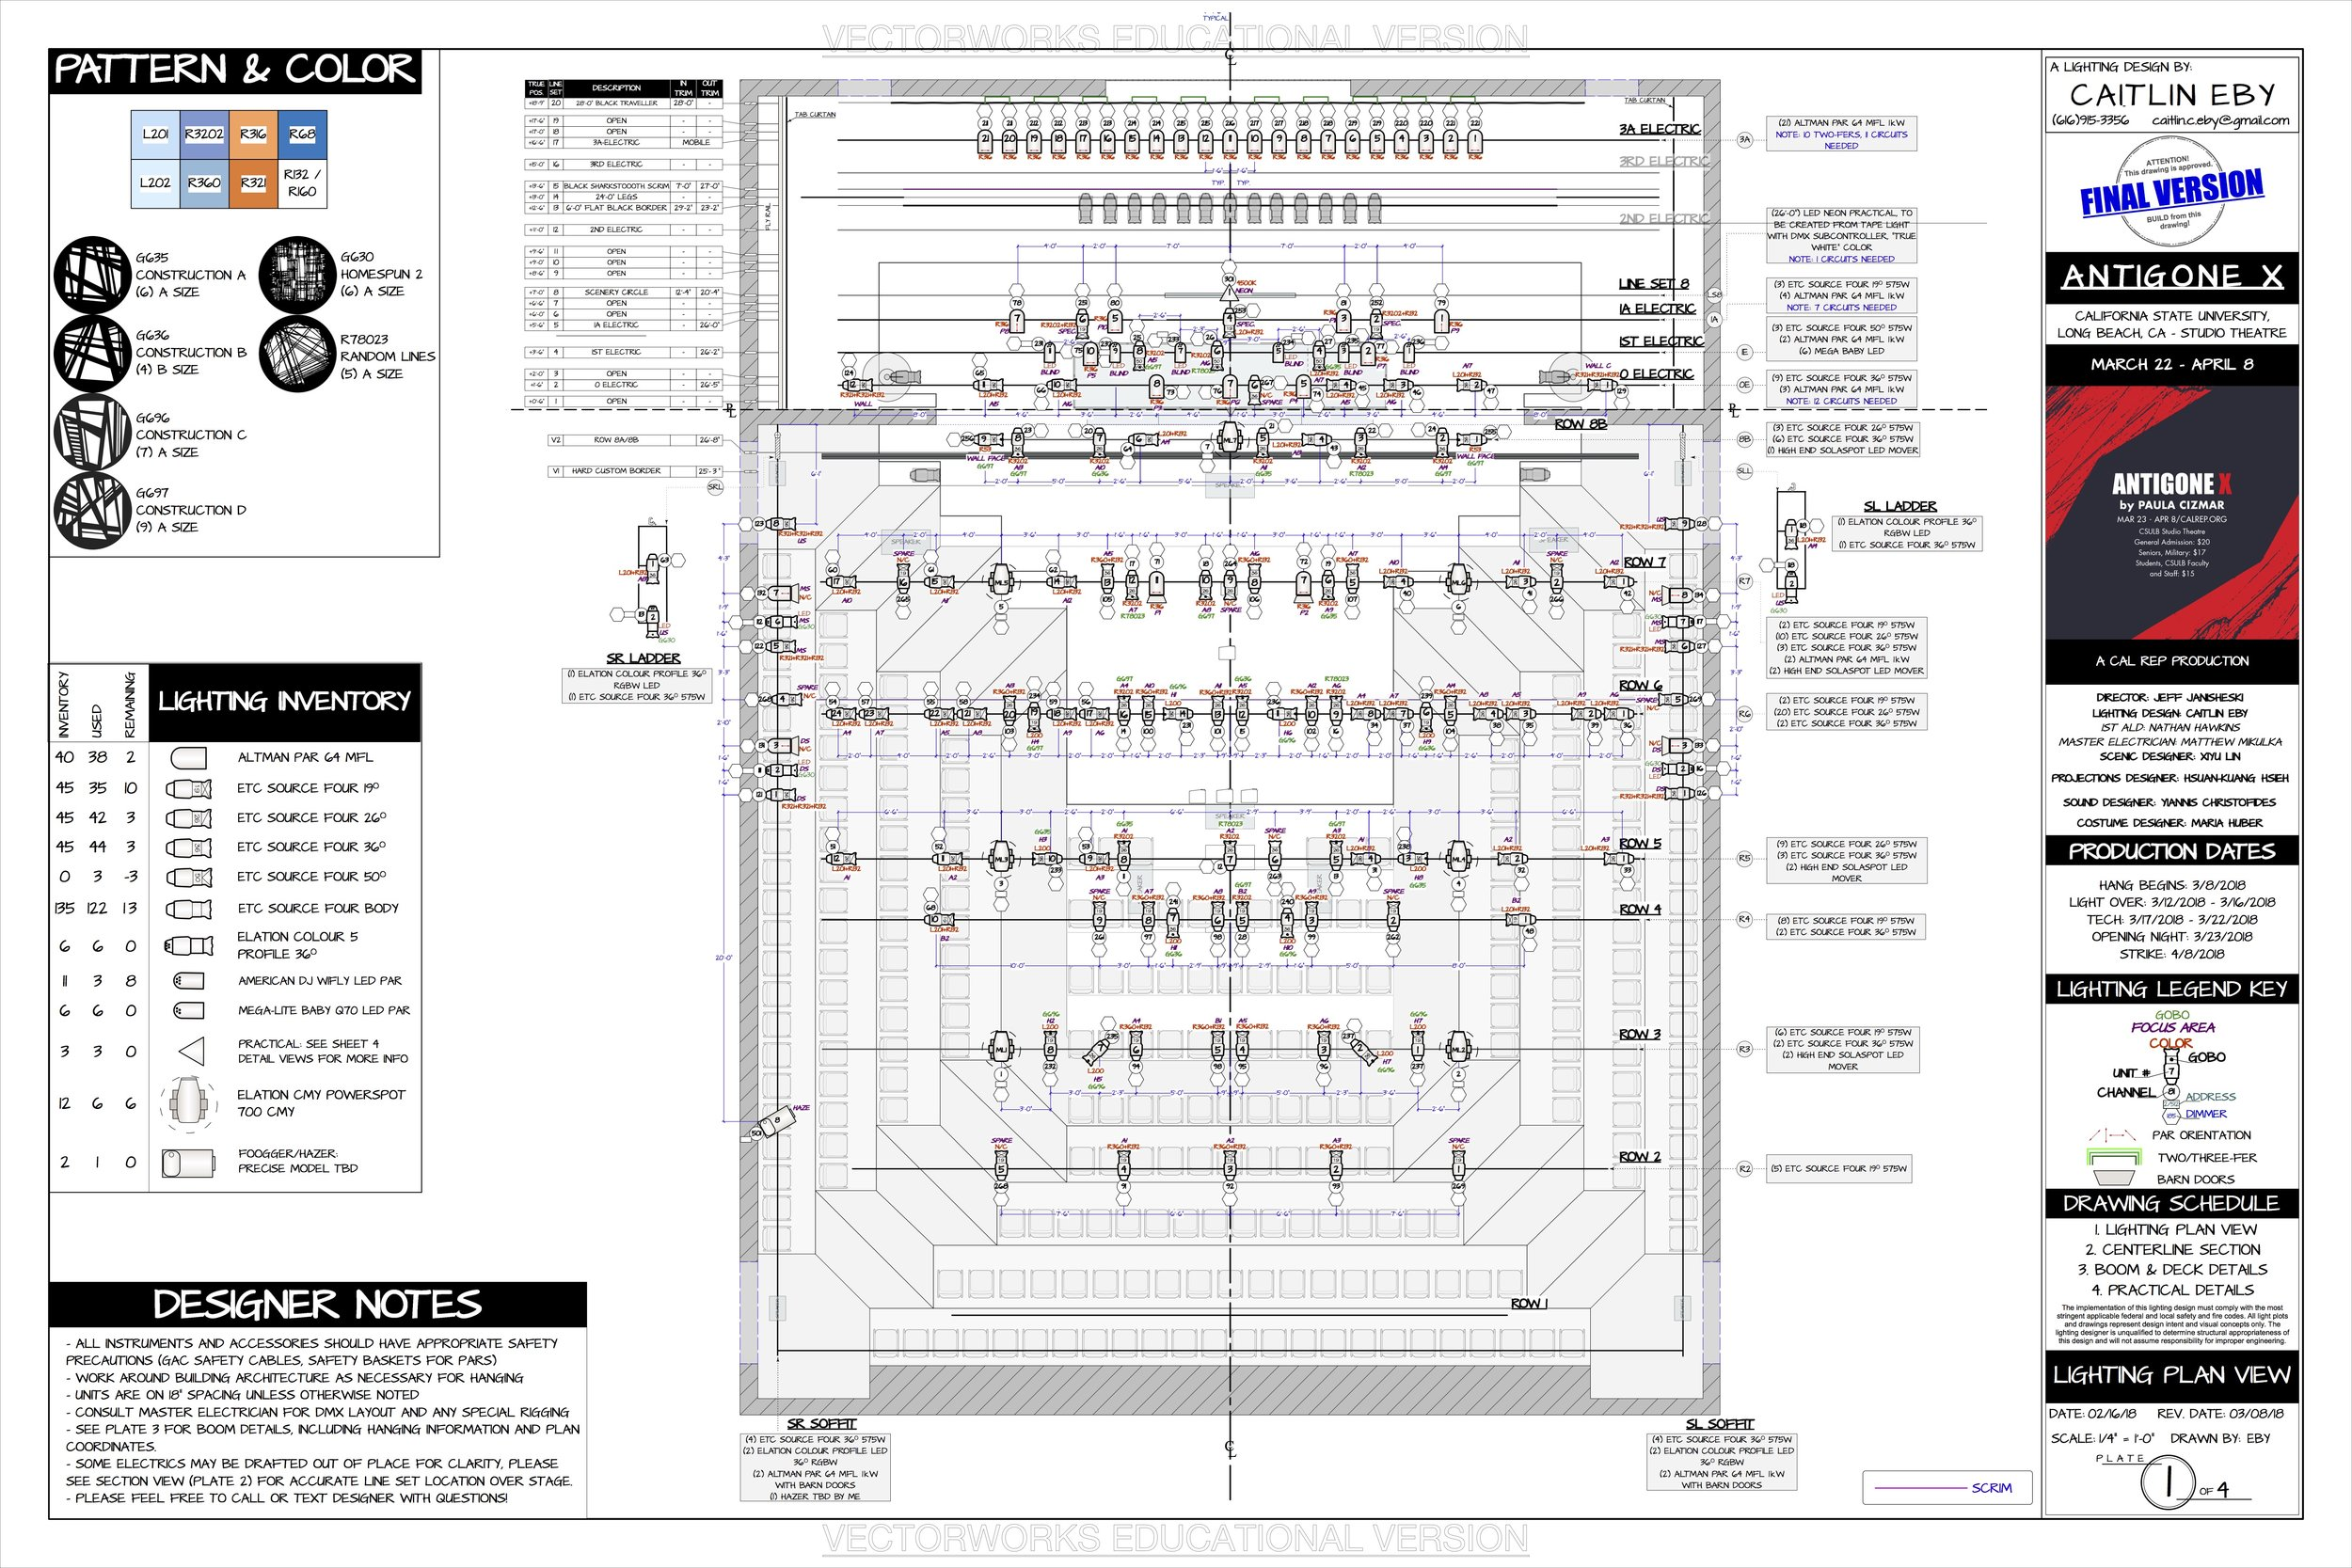 AntX-LTG-Plot-030818.jpg